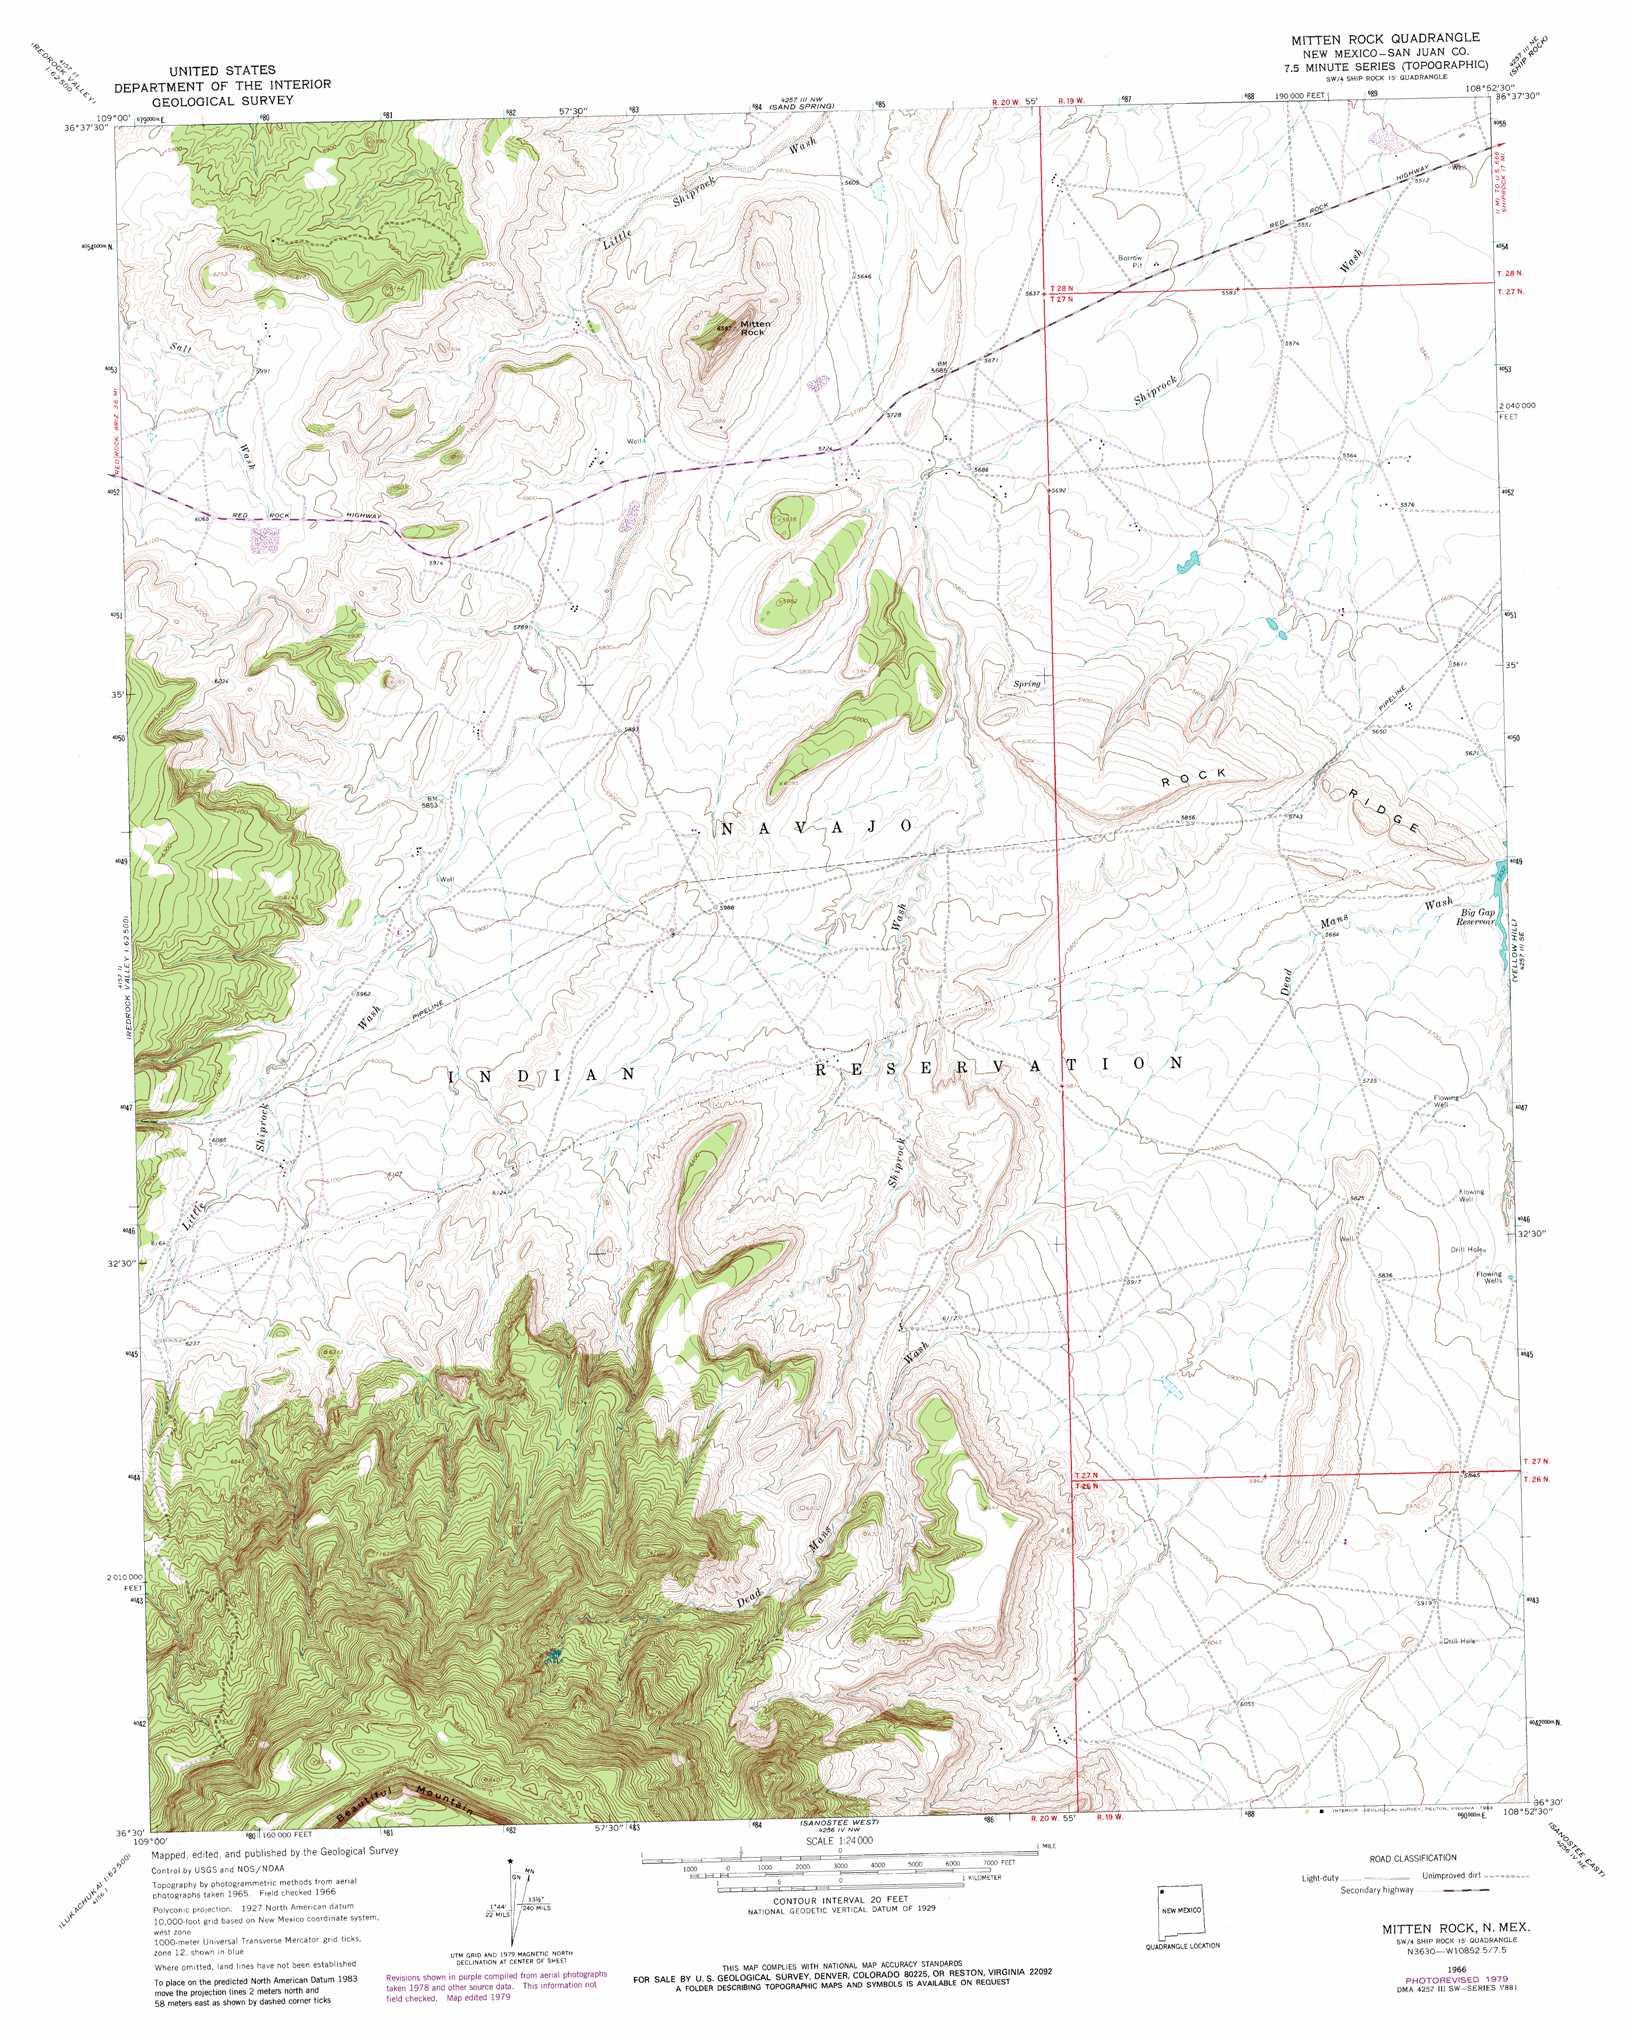 Mitten Rock Topographic Map NM  USGS Topo Quad 36108e8